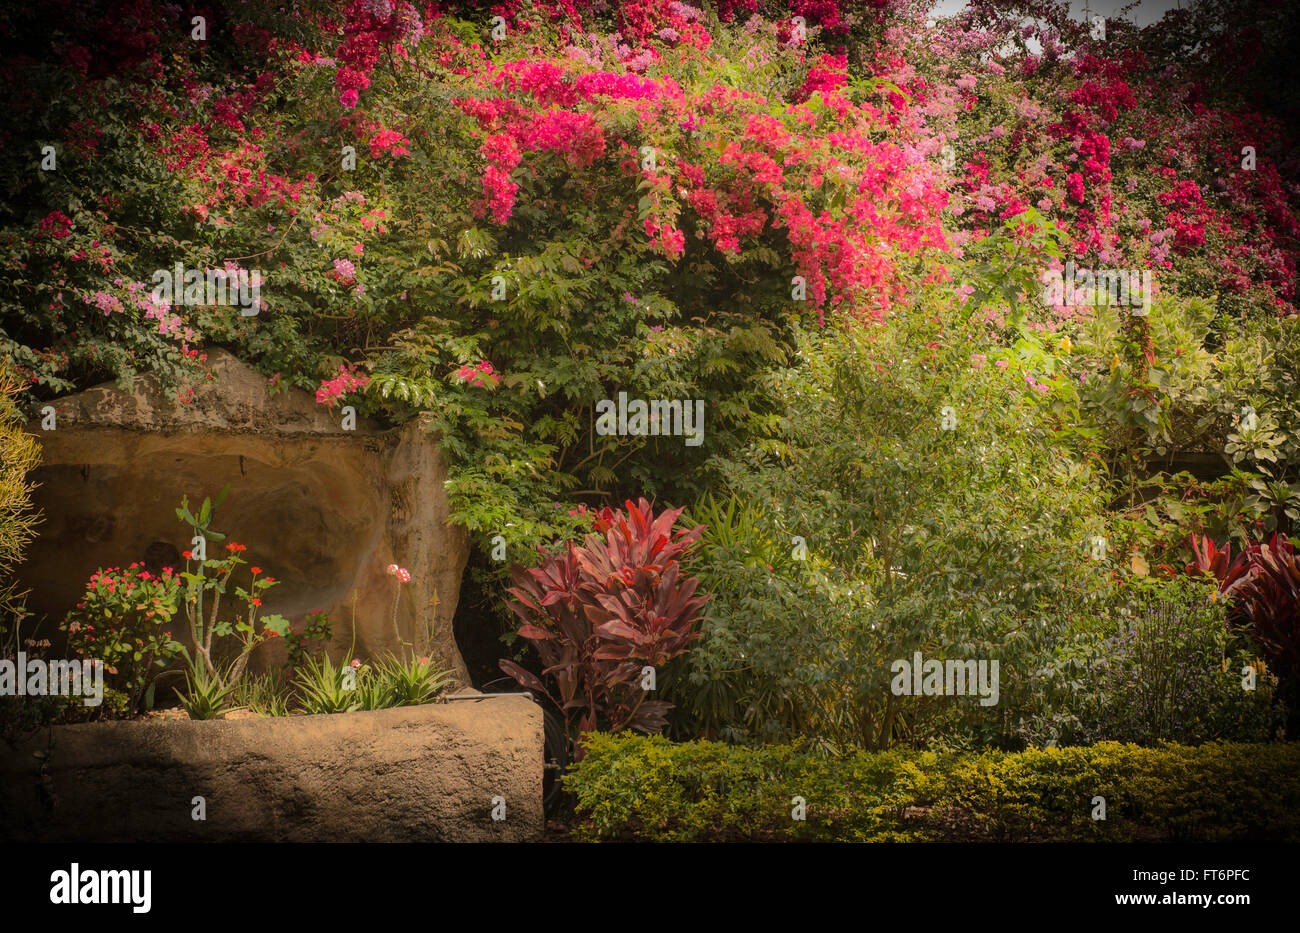 Florida Botanical Gardens Stock Photos & Florida Botanical Gardens ...